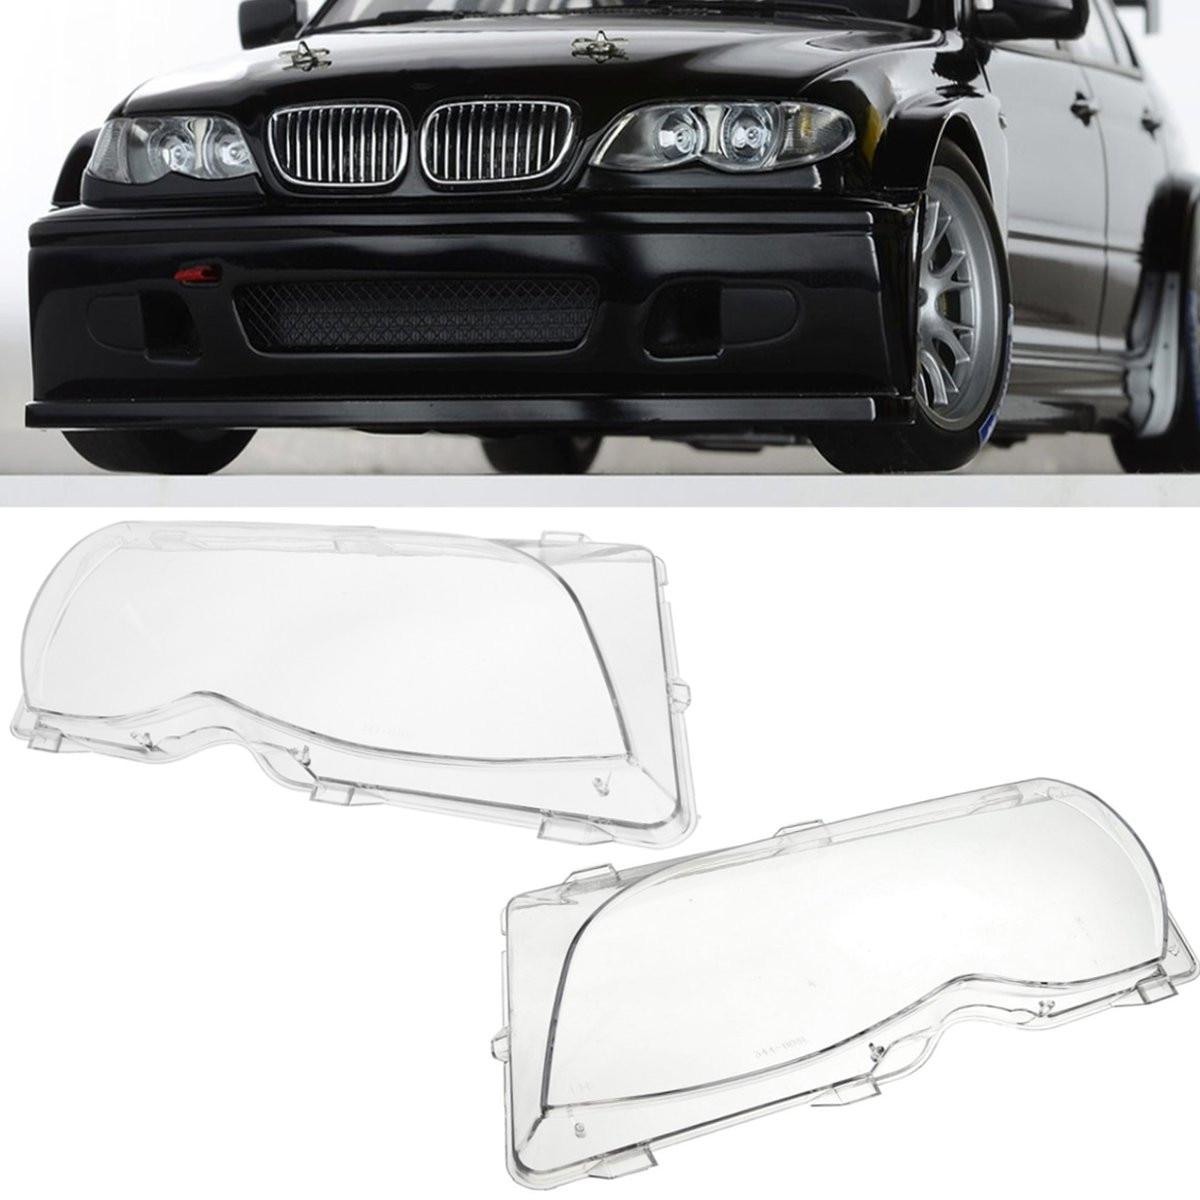 Left/Right Side Car Headlight Lens Covers Head Lamp Cover For BMW E46 320i/325i/325xi 4DR Sedan 2001 2002 2003 2004 2005 2006